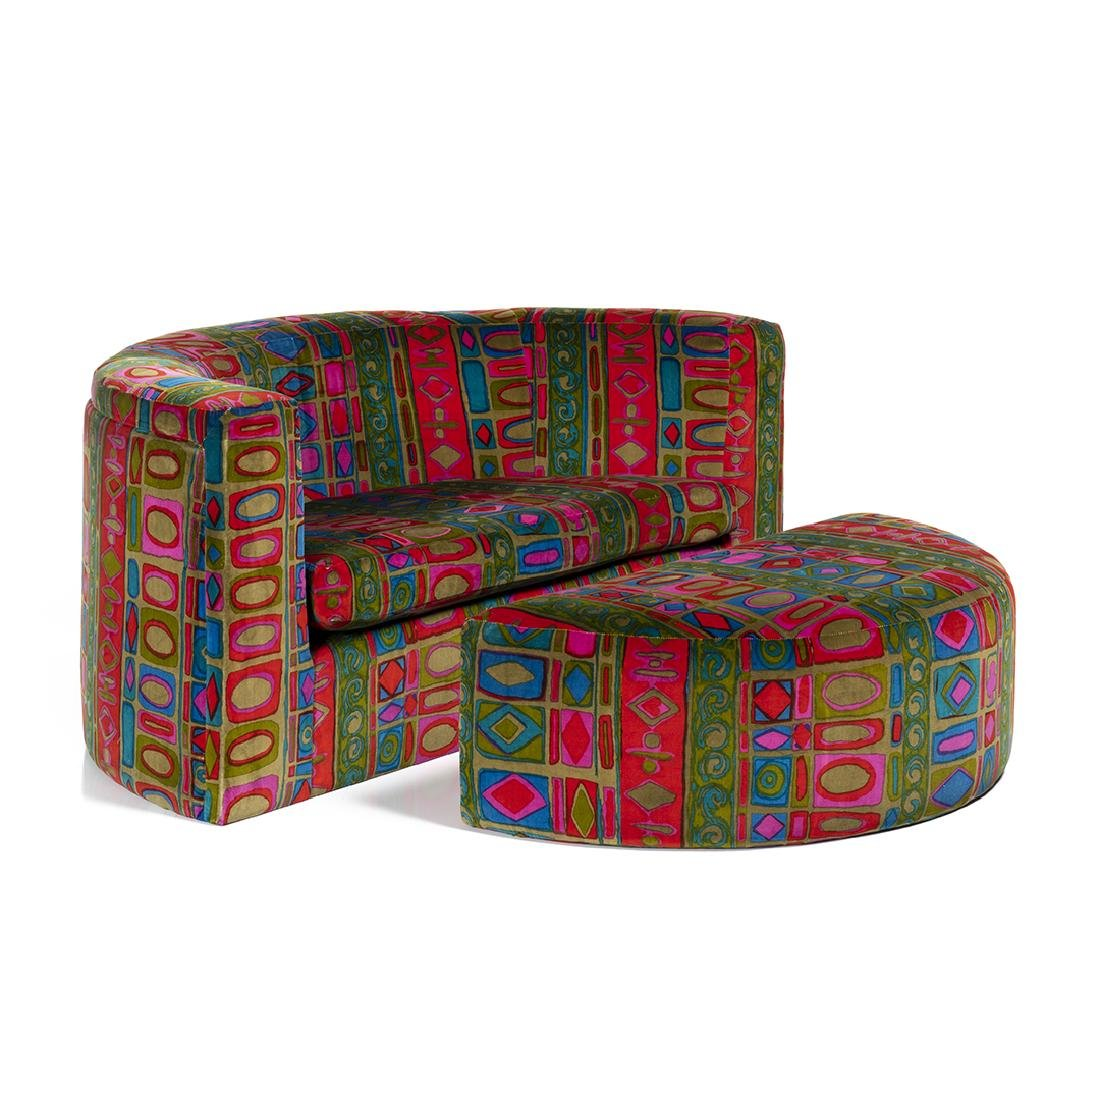 Milo Baughman Lounge Chair and Ottoman